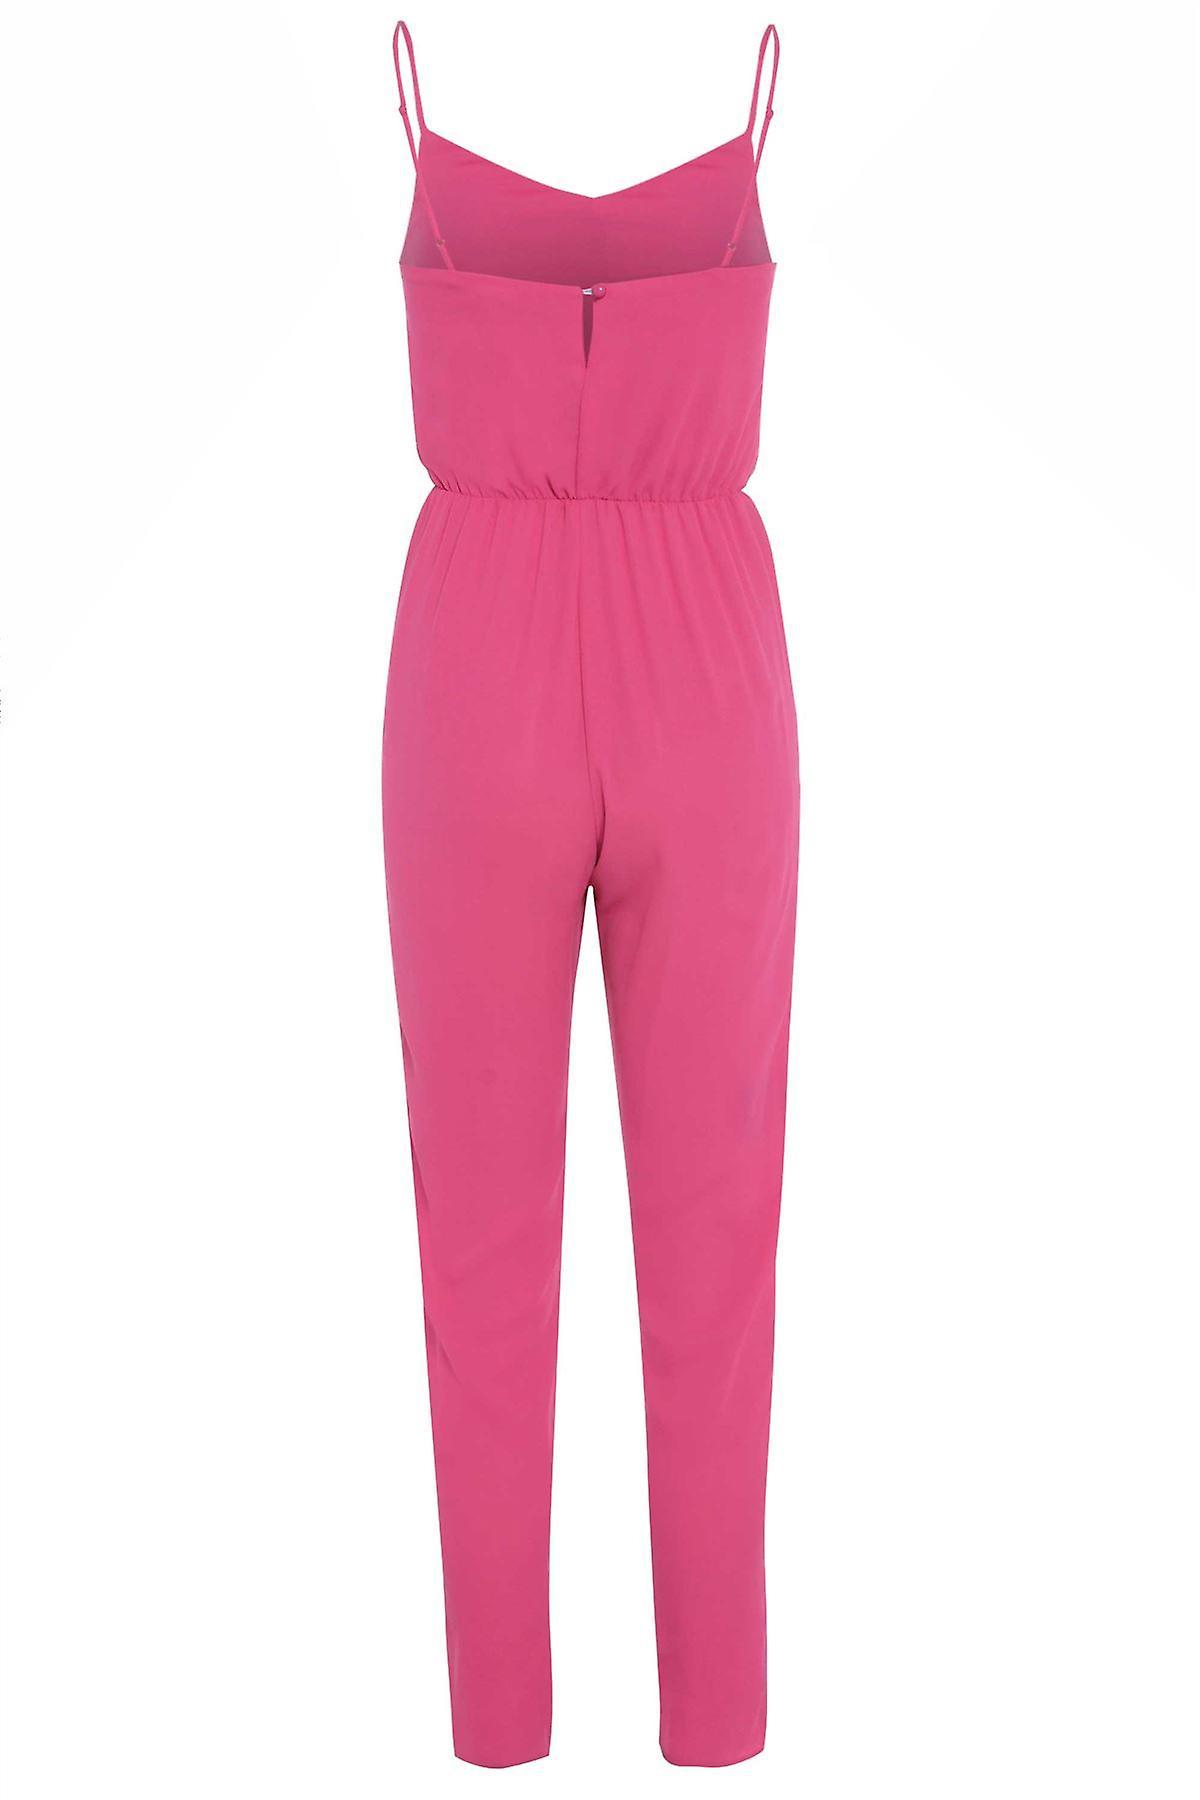 New Look Pink Sateen Jumpsuit